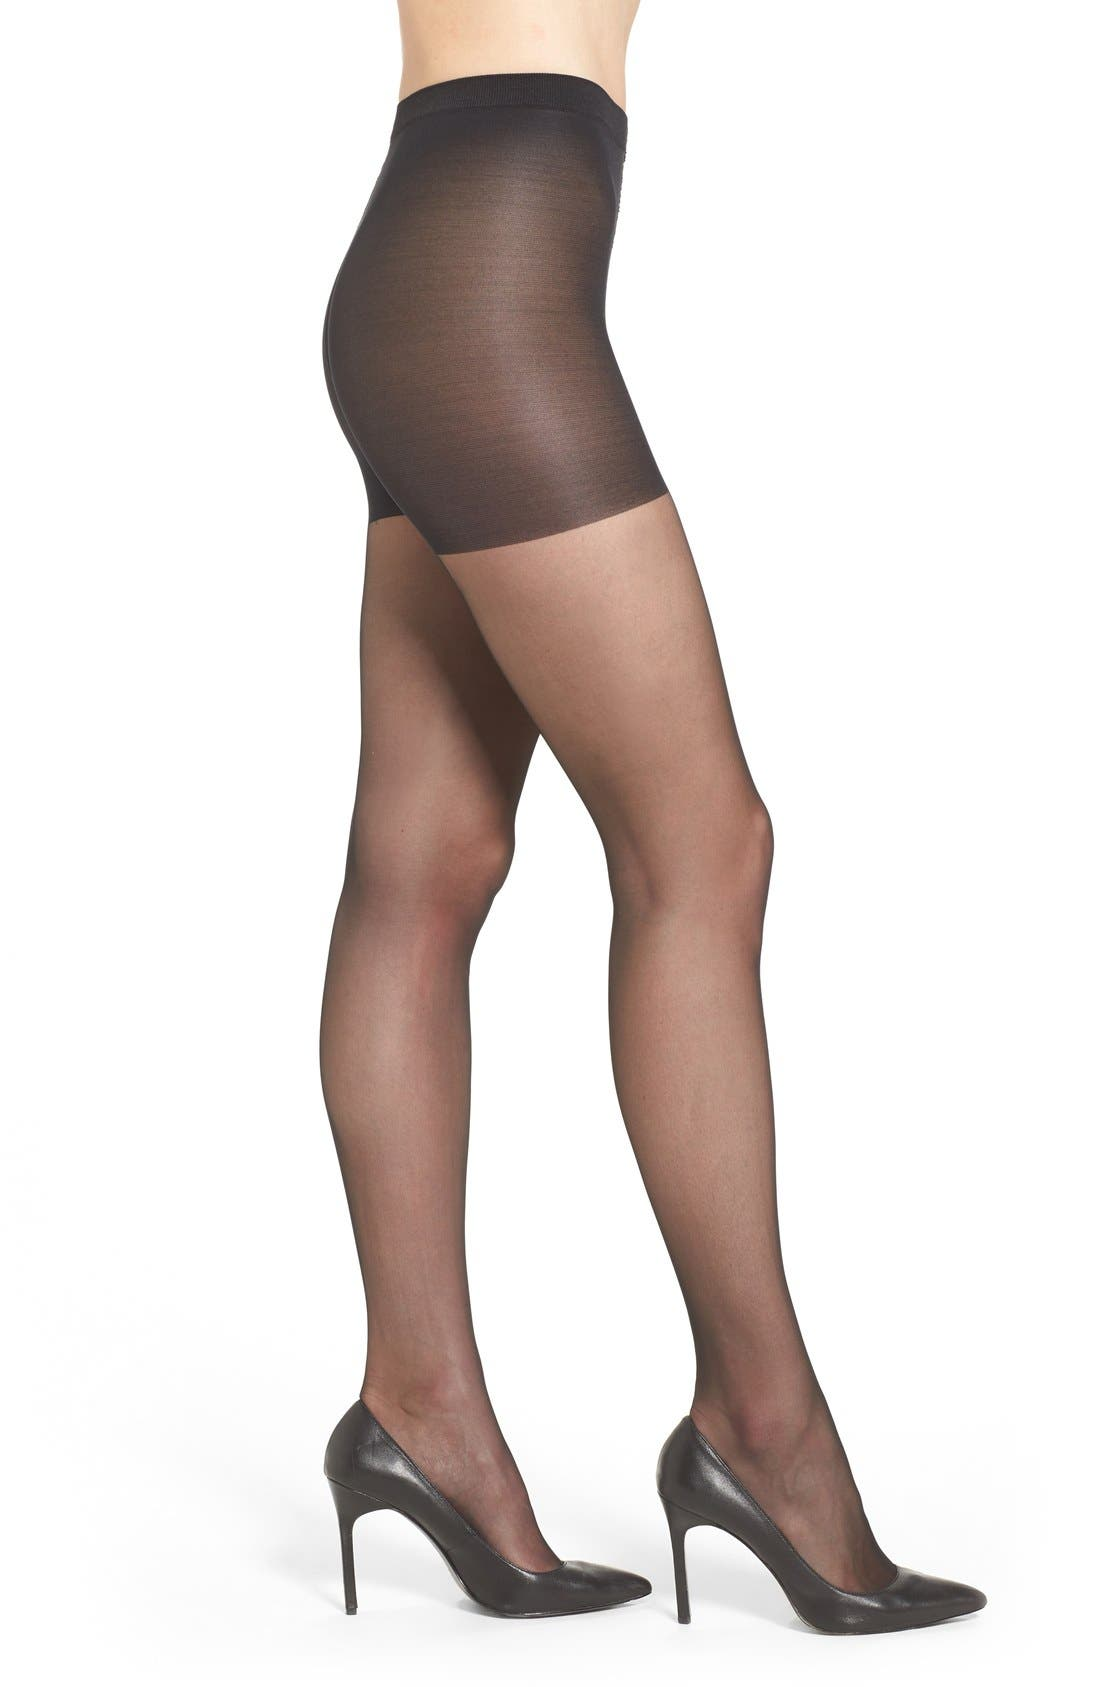 Main Image - Wolford Individual 10 Control Top Pantyhose